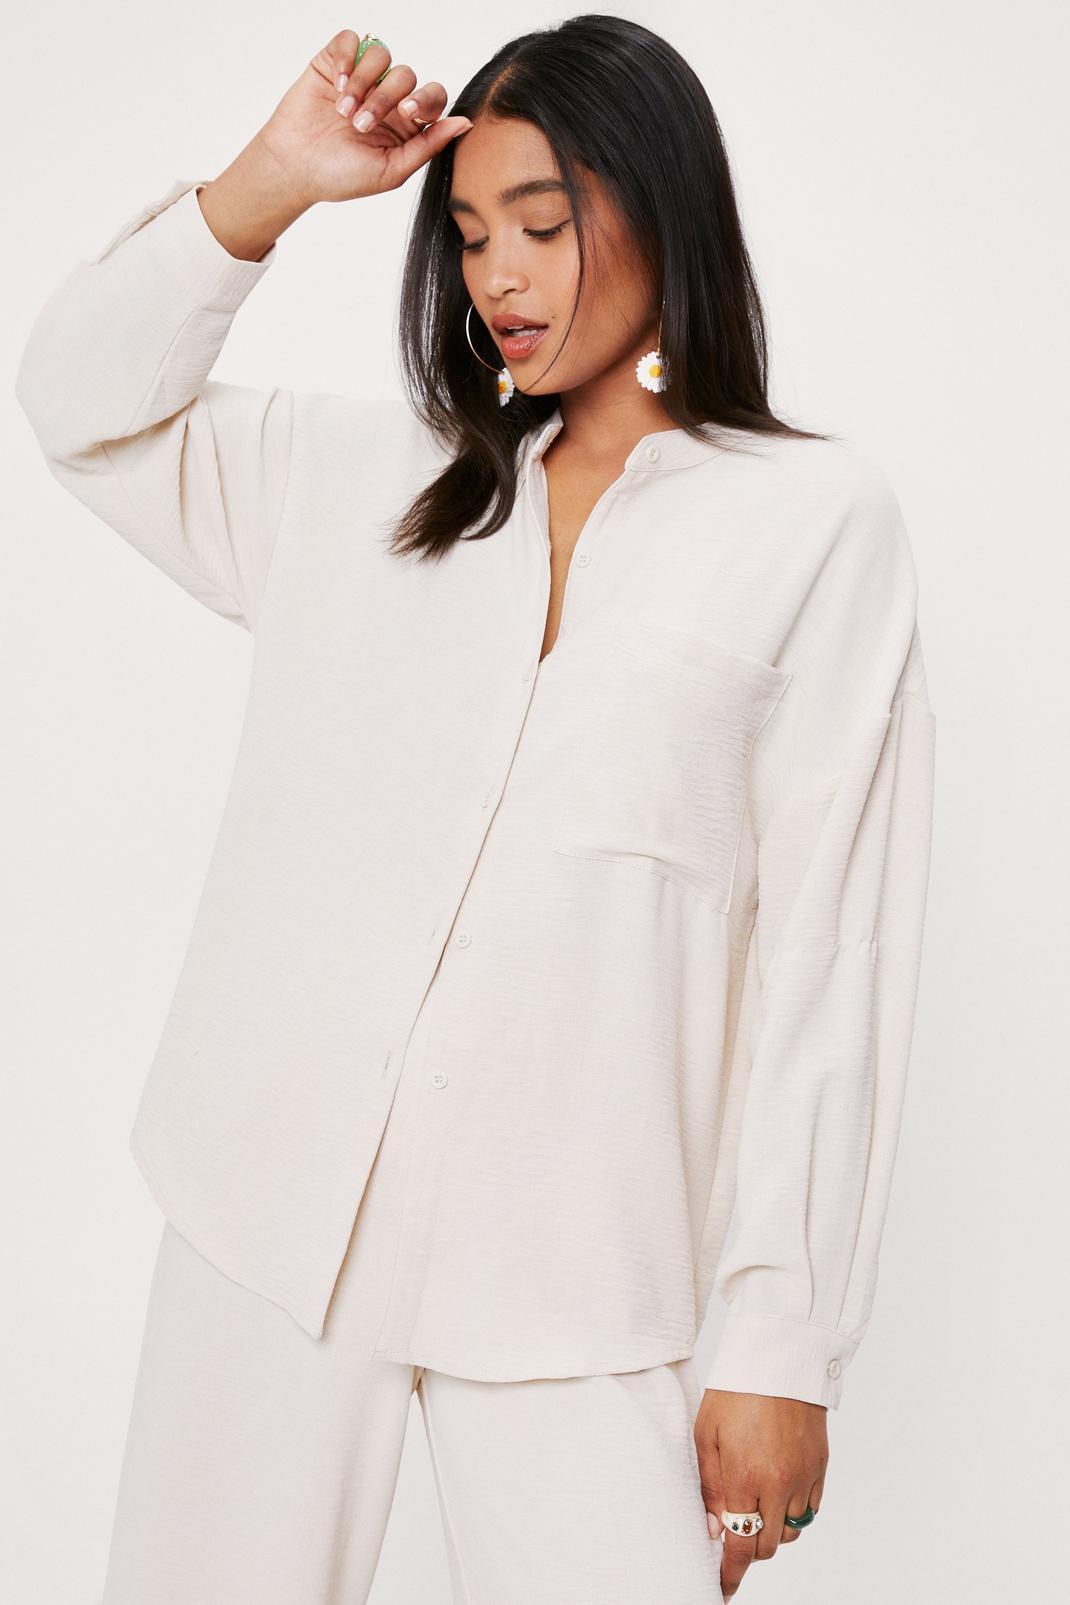 Oversized Pocket Detail Button Down Shirt   NastyGal